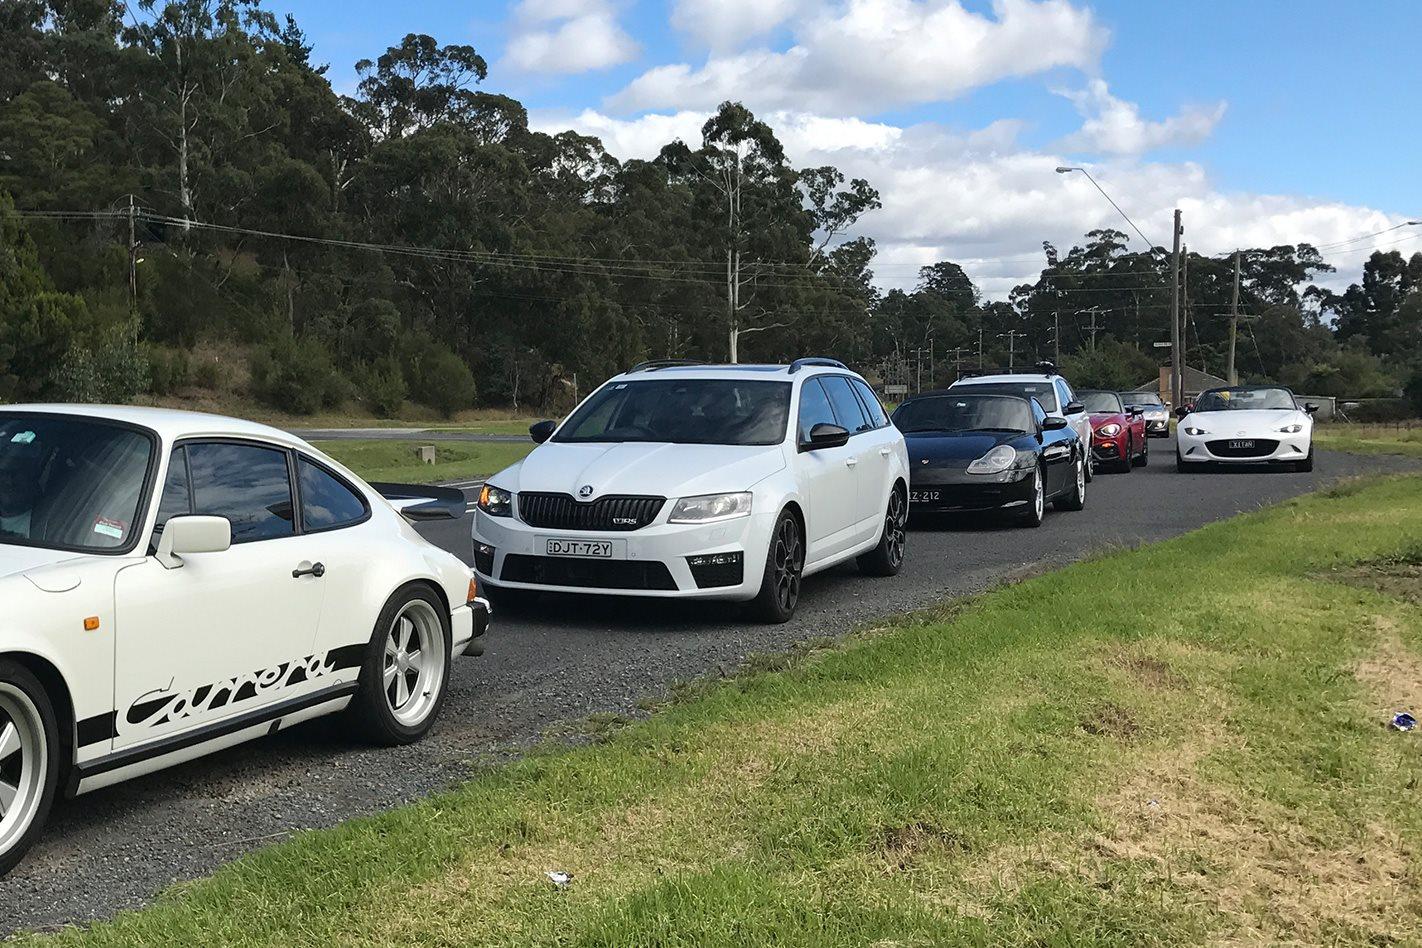 2017 Skoda Octavia RS230 convoy